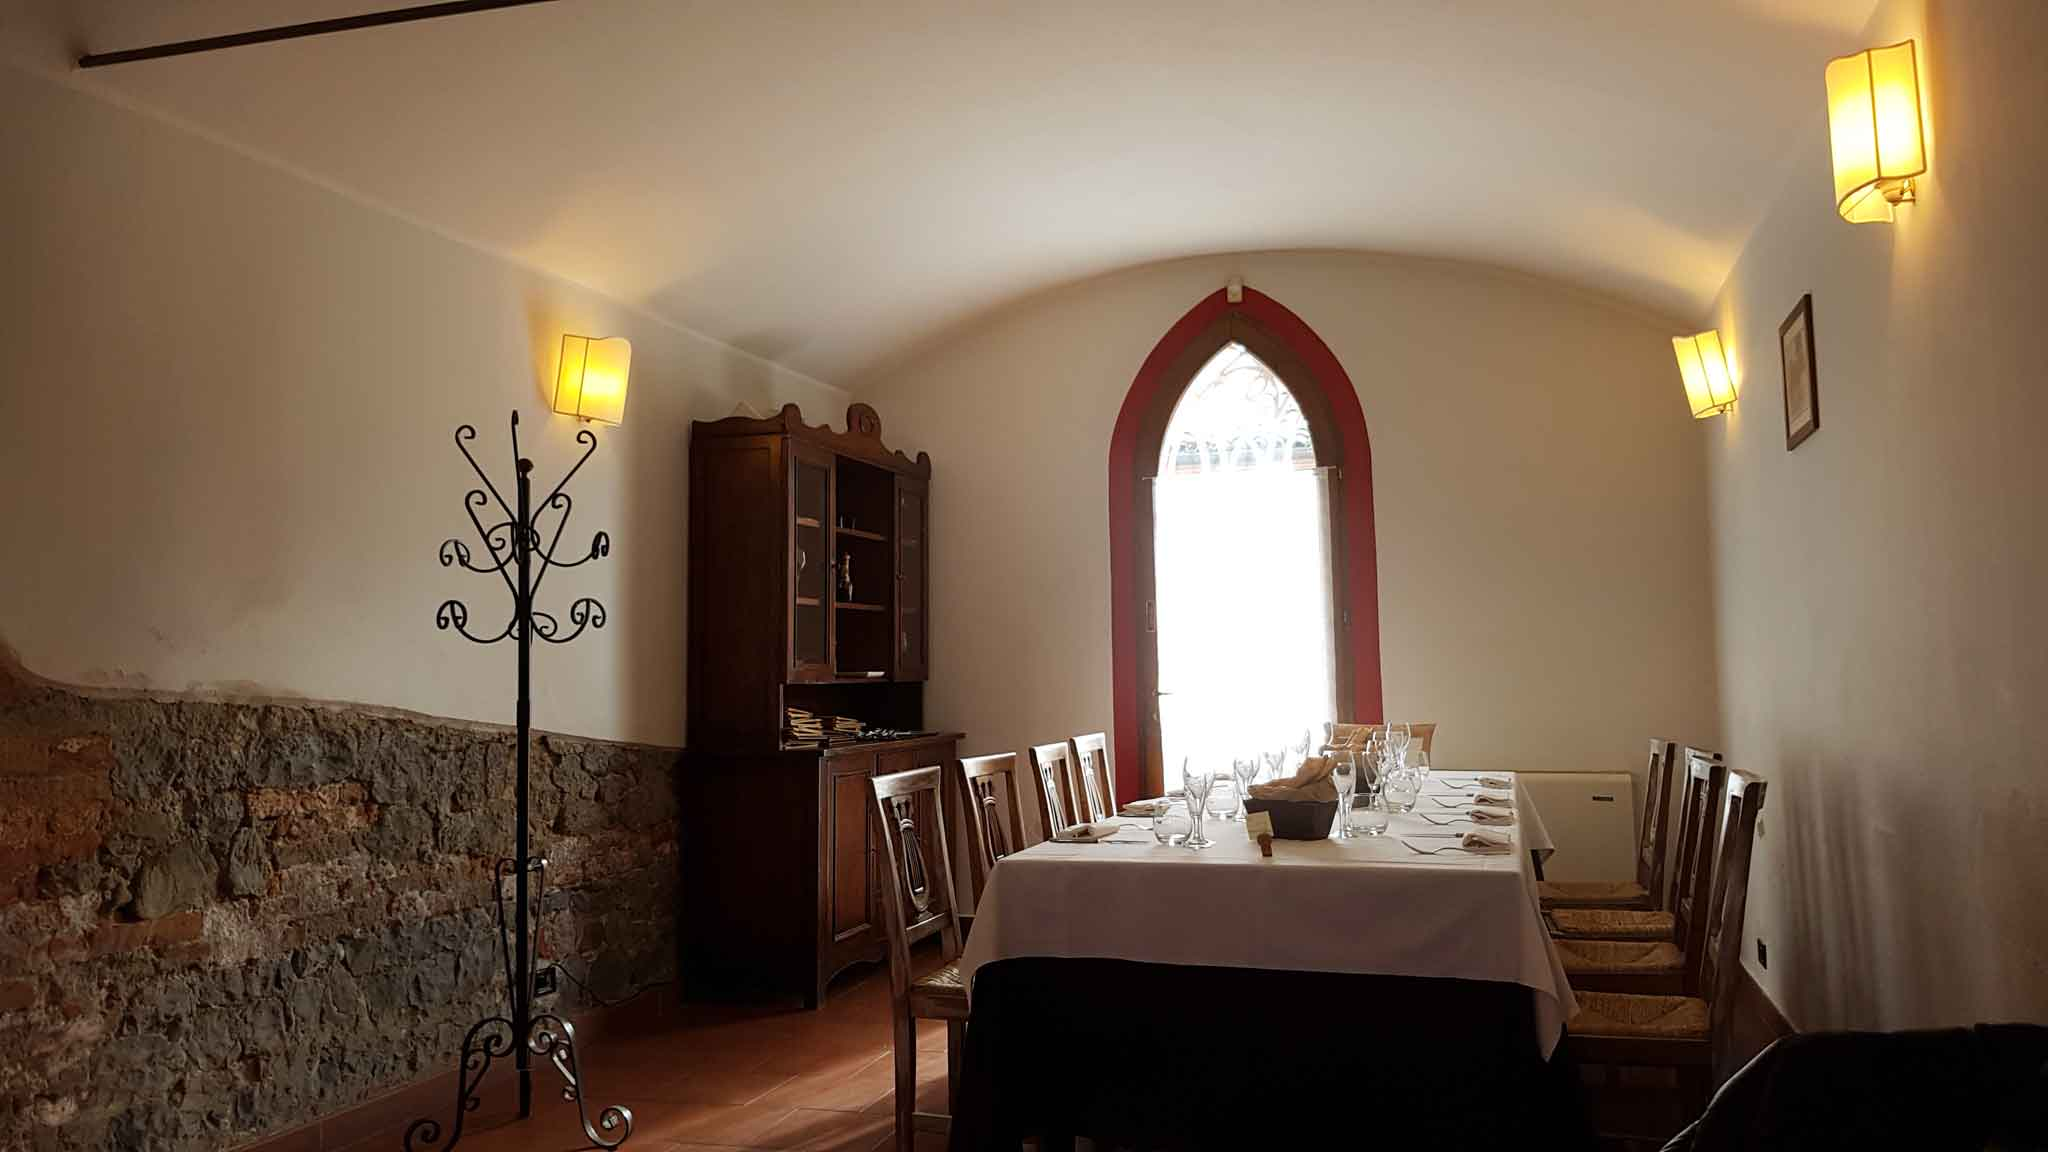 ristorante-badesse-casalgrande-sala